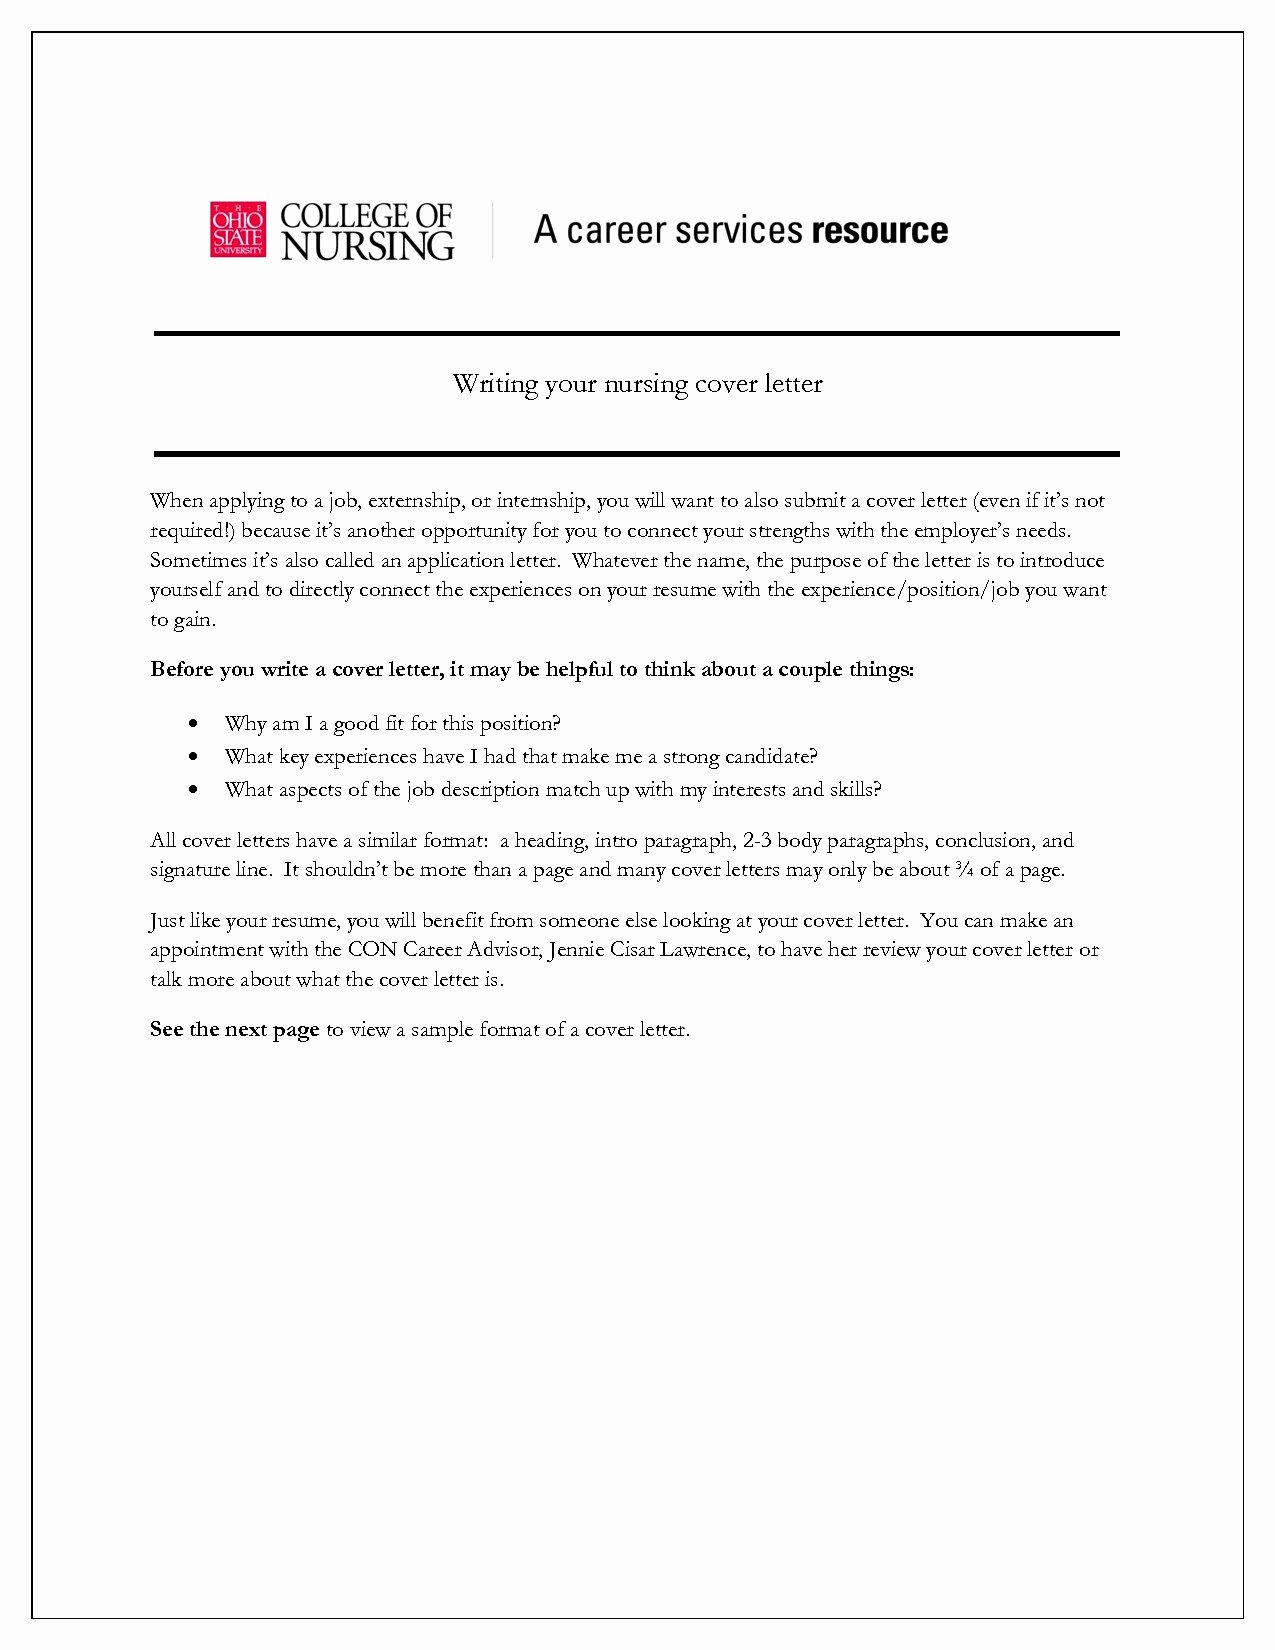 Nurse Externship Cover Letter Cover Letter Cover Letter